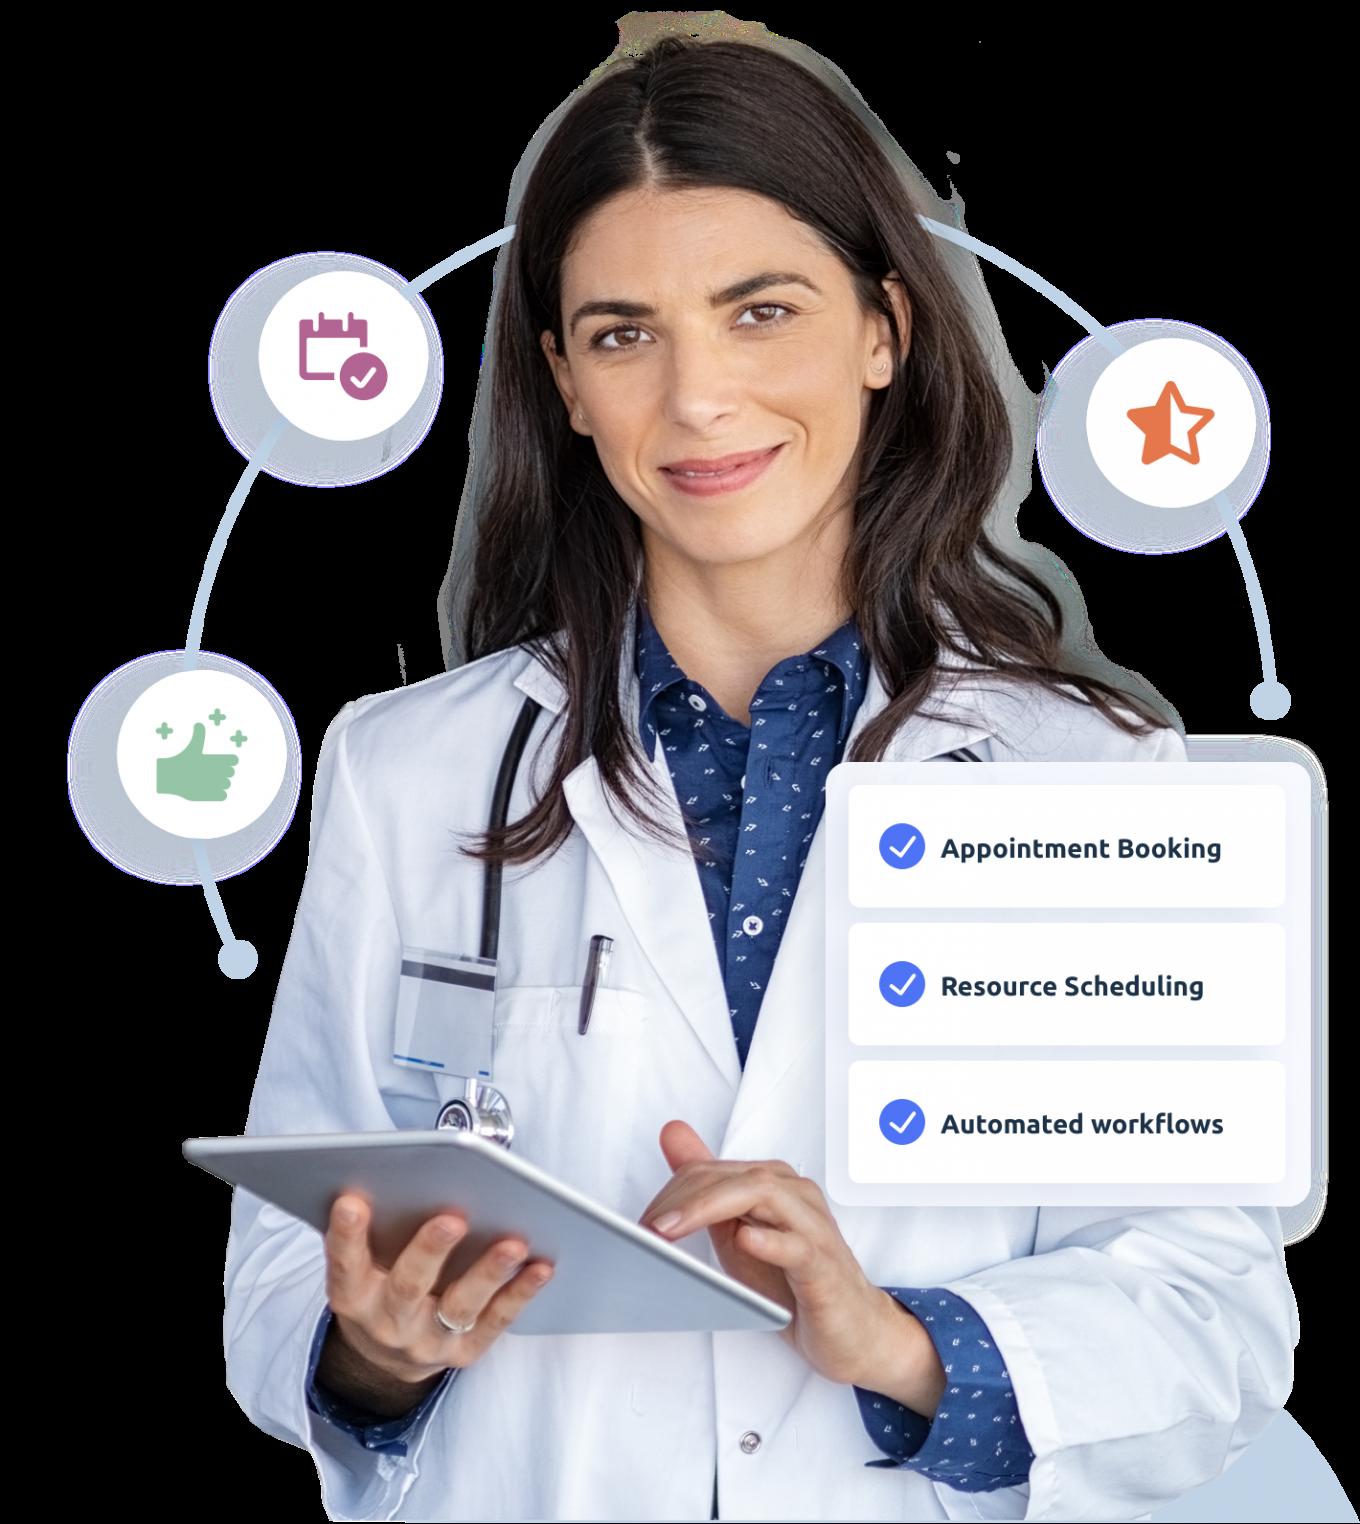 Medical scheduling software